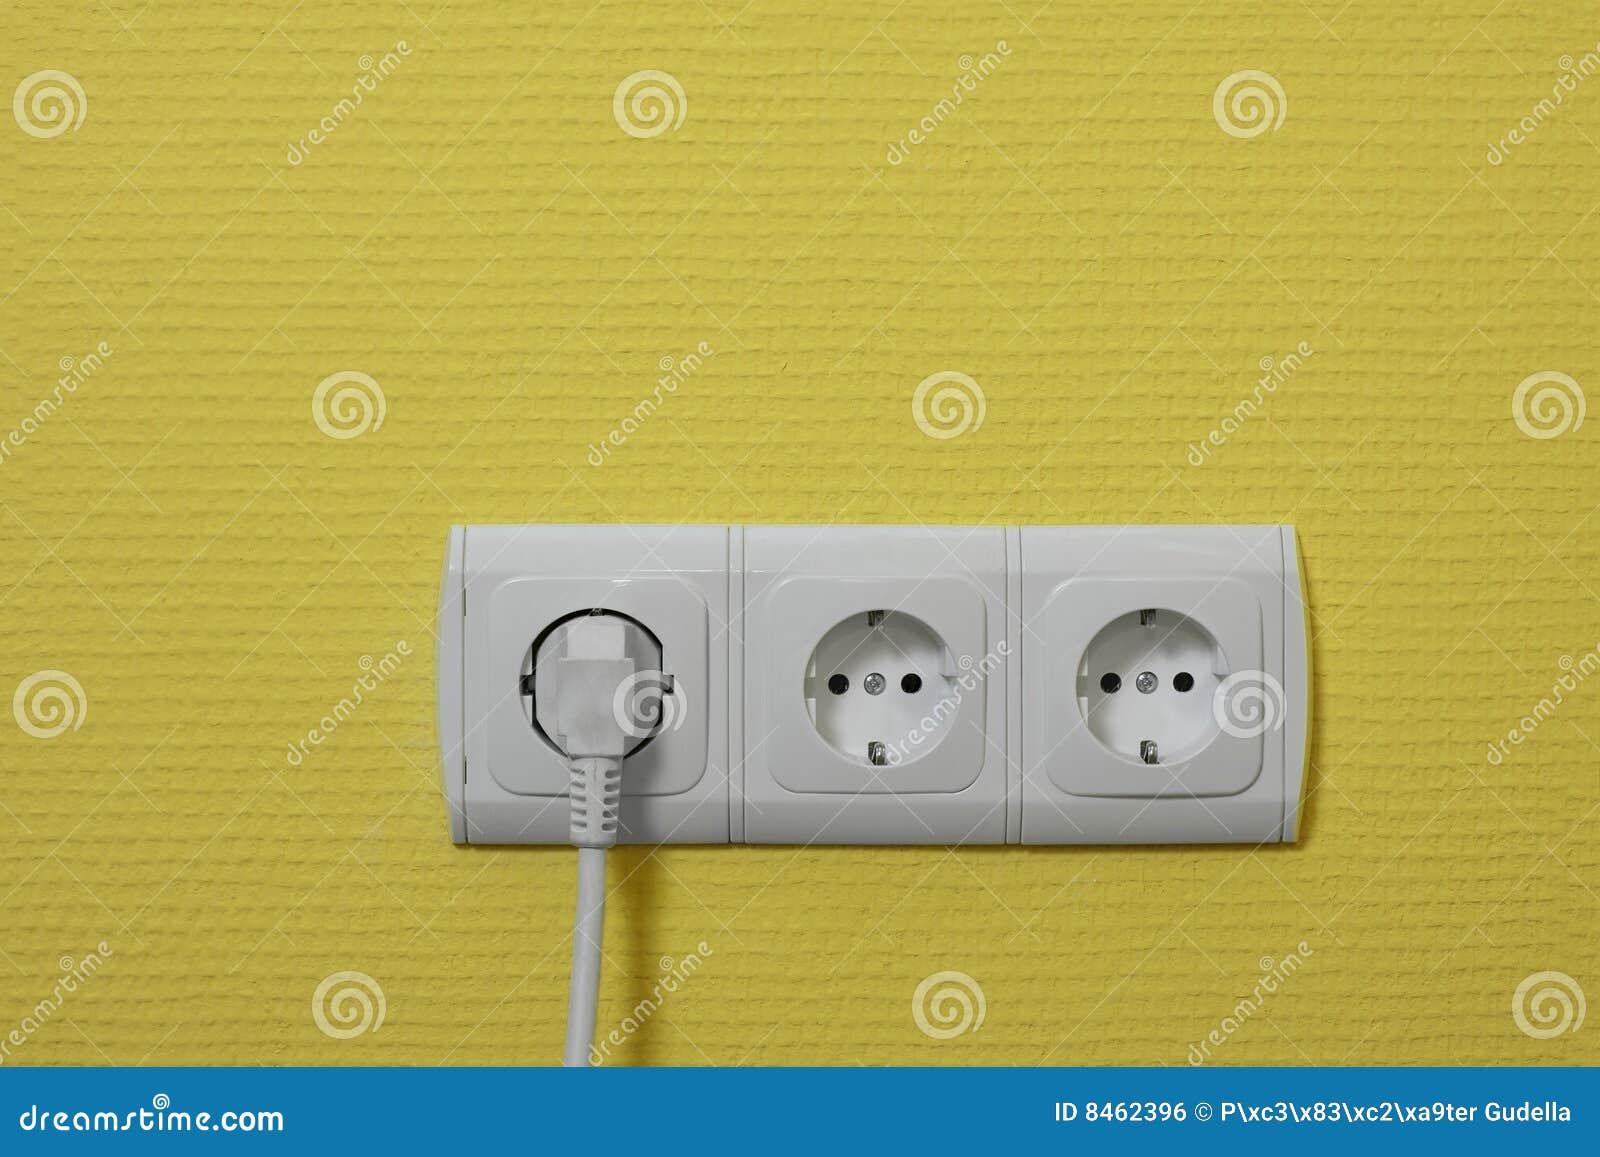 Socketes eléctricos